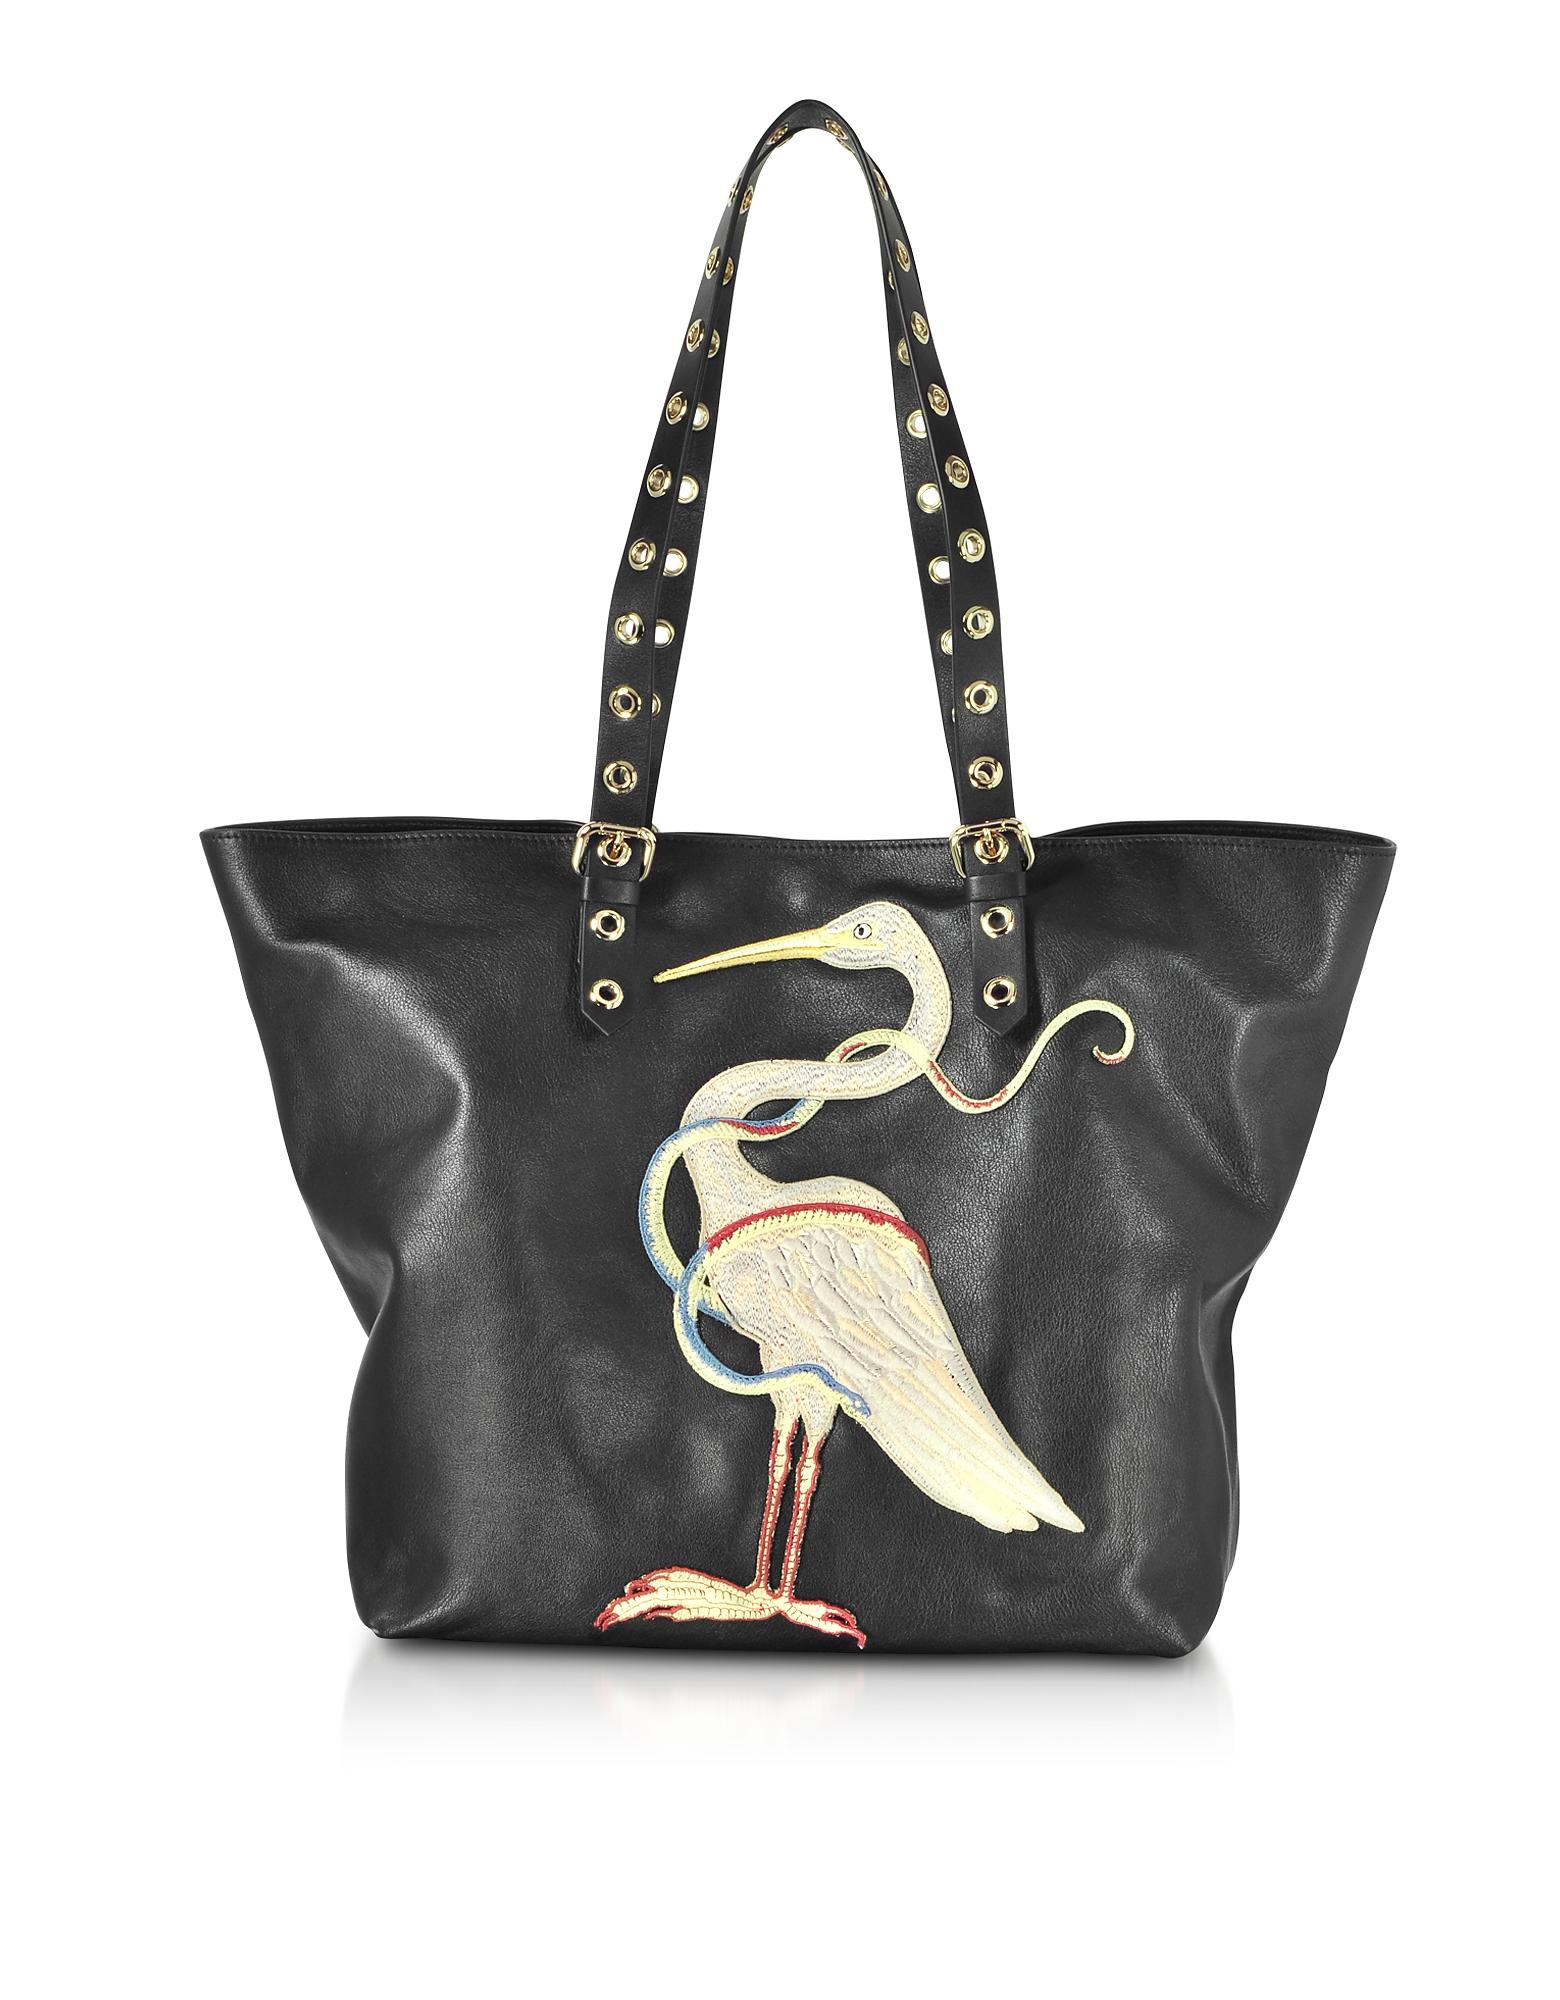 RED Valentino Handbags, Embroidered Bird Tote